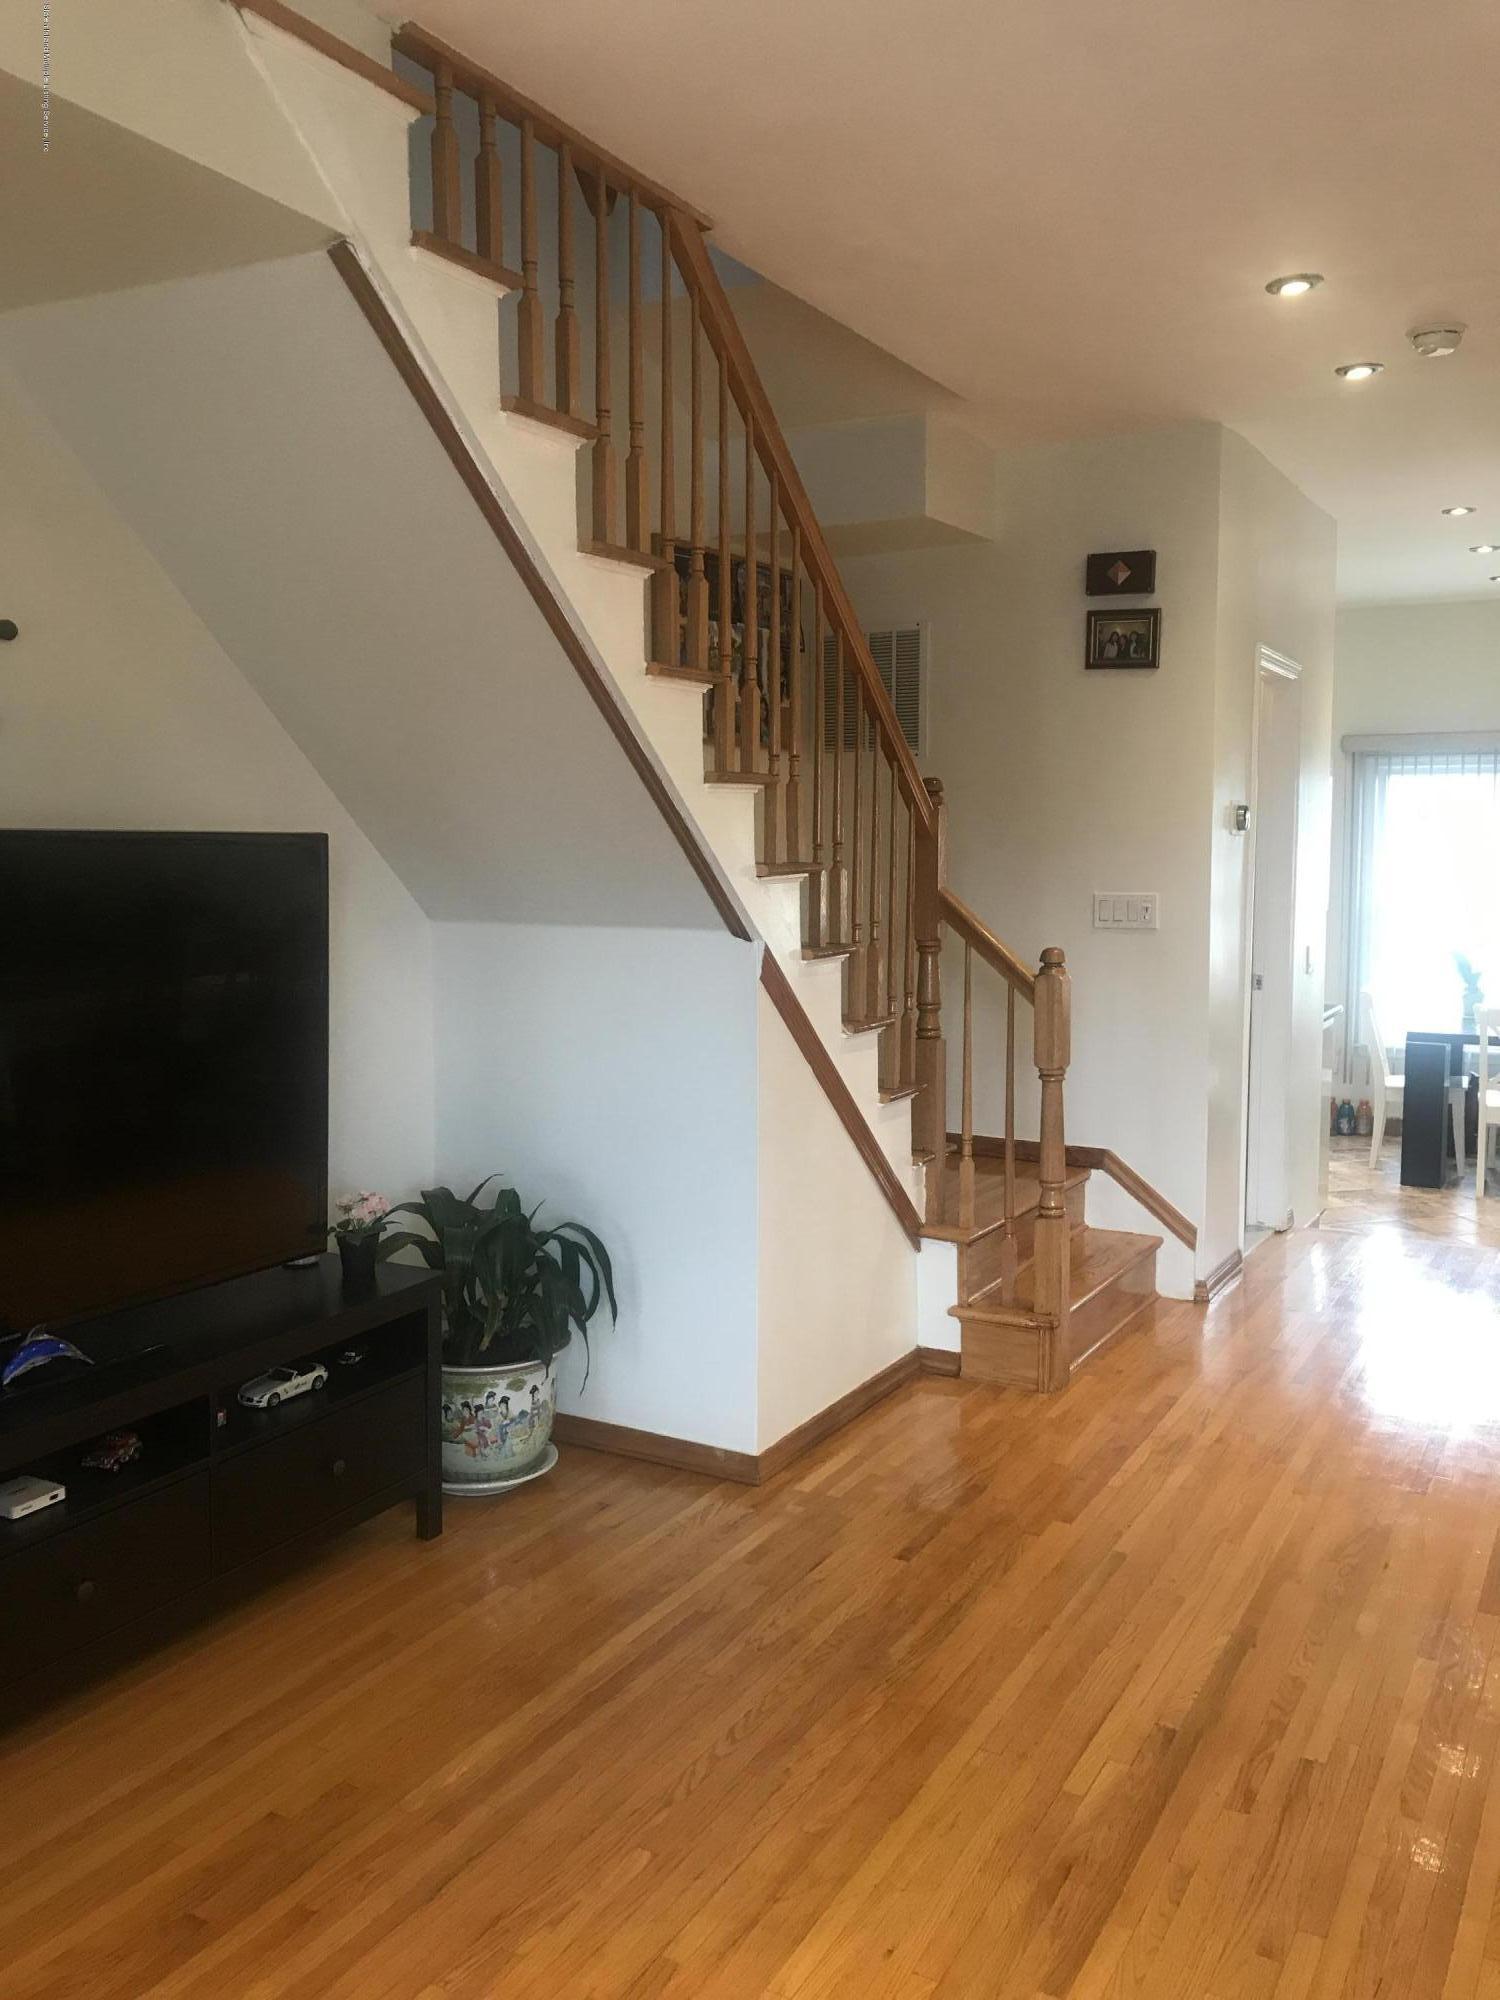 Single Family - Attached 58 Garretson Lane  Staten Island, NY 10304, MLS-1128138-11